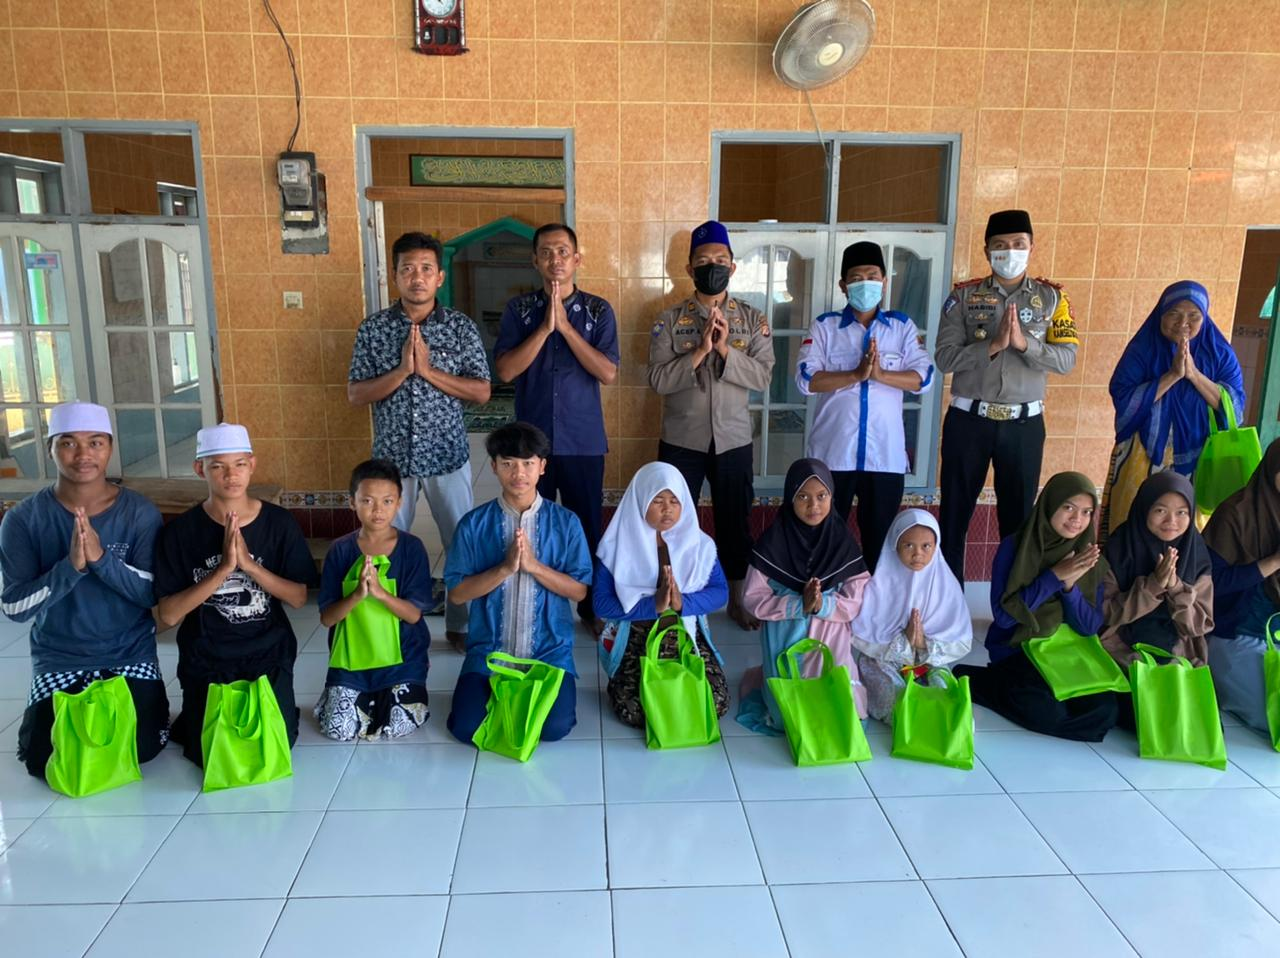 Kasat Lantas Polres Ciko, Berikan Bantuan Al- Qur'an di Musholla Nurul Hidayah